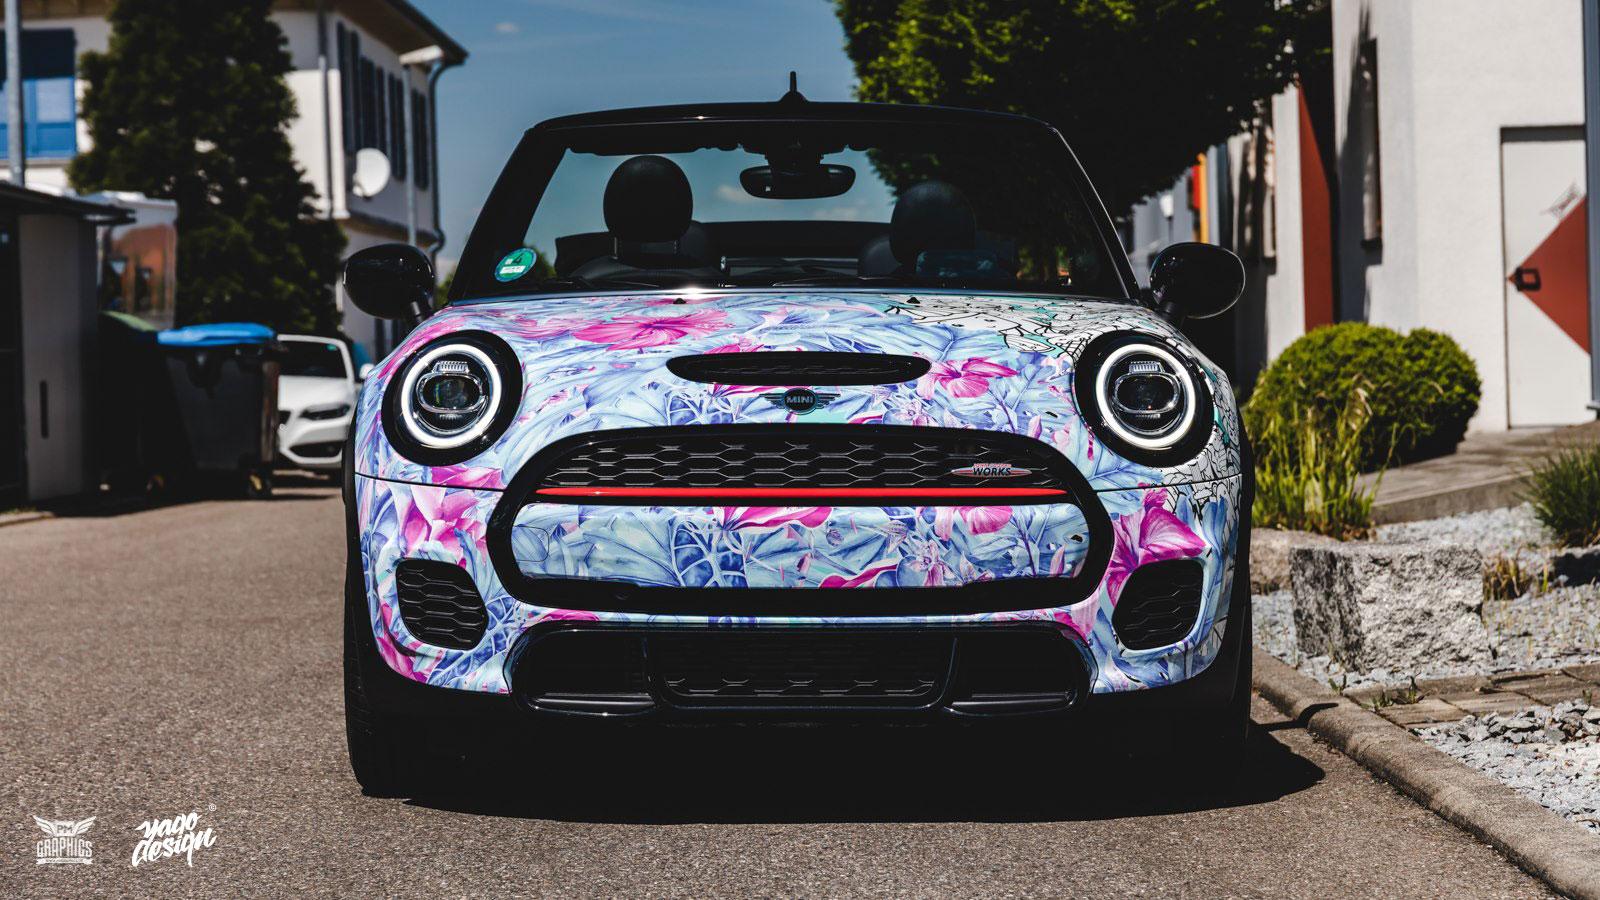 Mini-cooper-JCW-by-Yagodesign-by-Kamil-Lizak-Car-wrapping-Design-Studio-Automotive-Design-Studio-Kawai-7